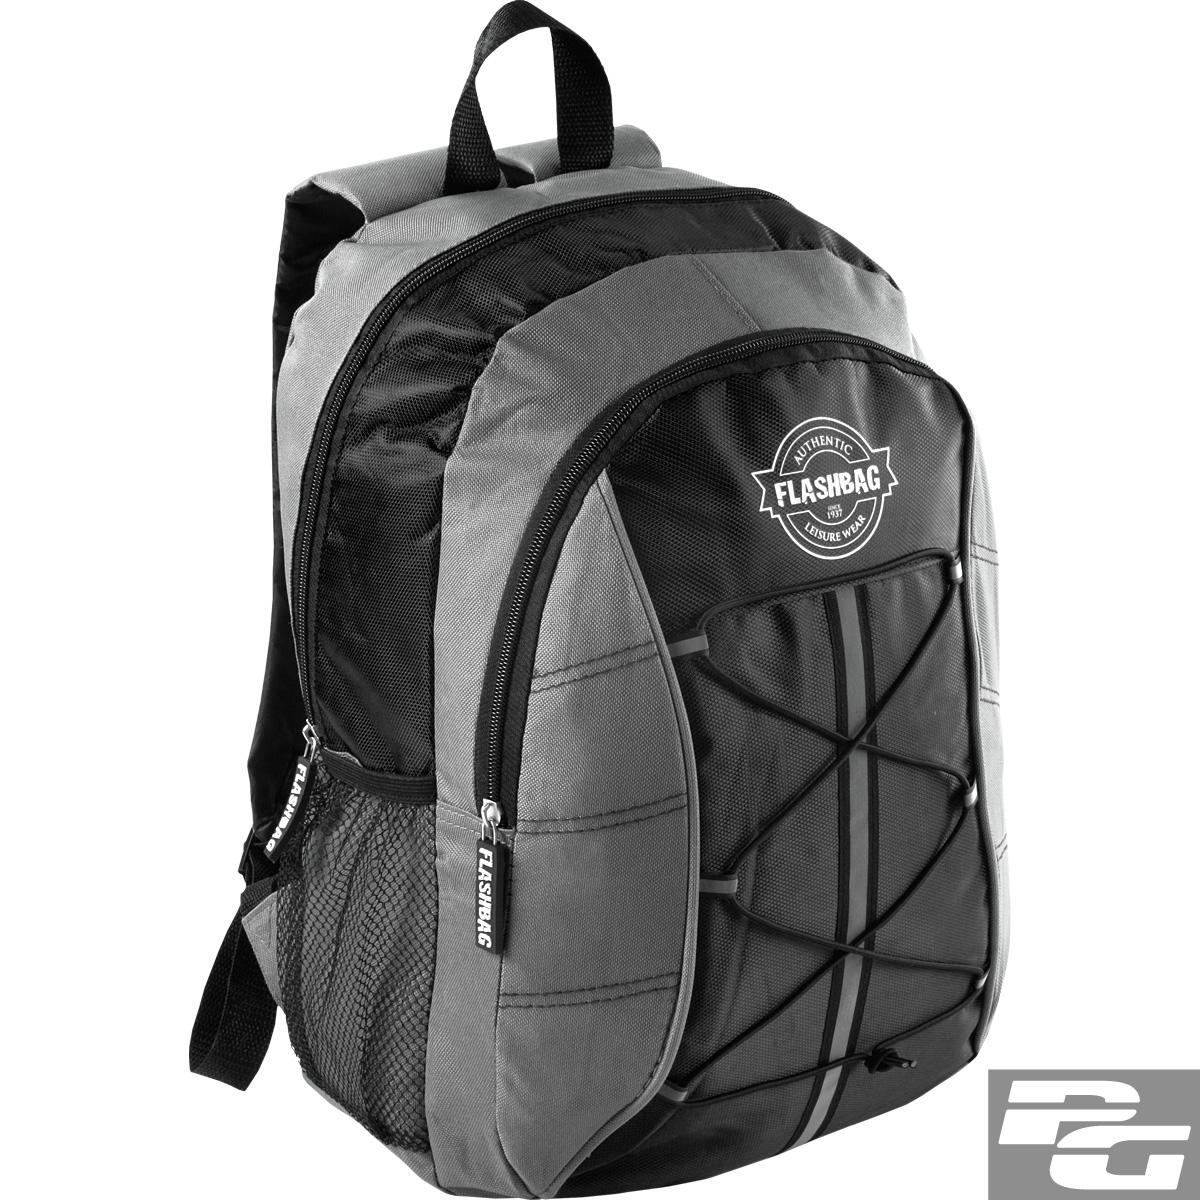 Rucksack-Backpack-Sport-Freizeit-Schule-Reise-Outdoor-Wandern-Trekking-NEU